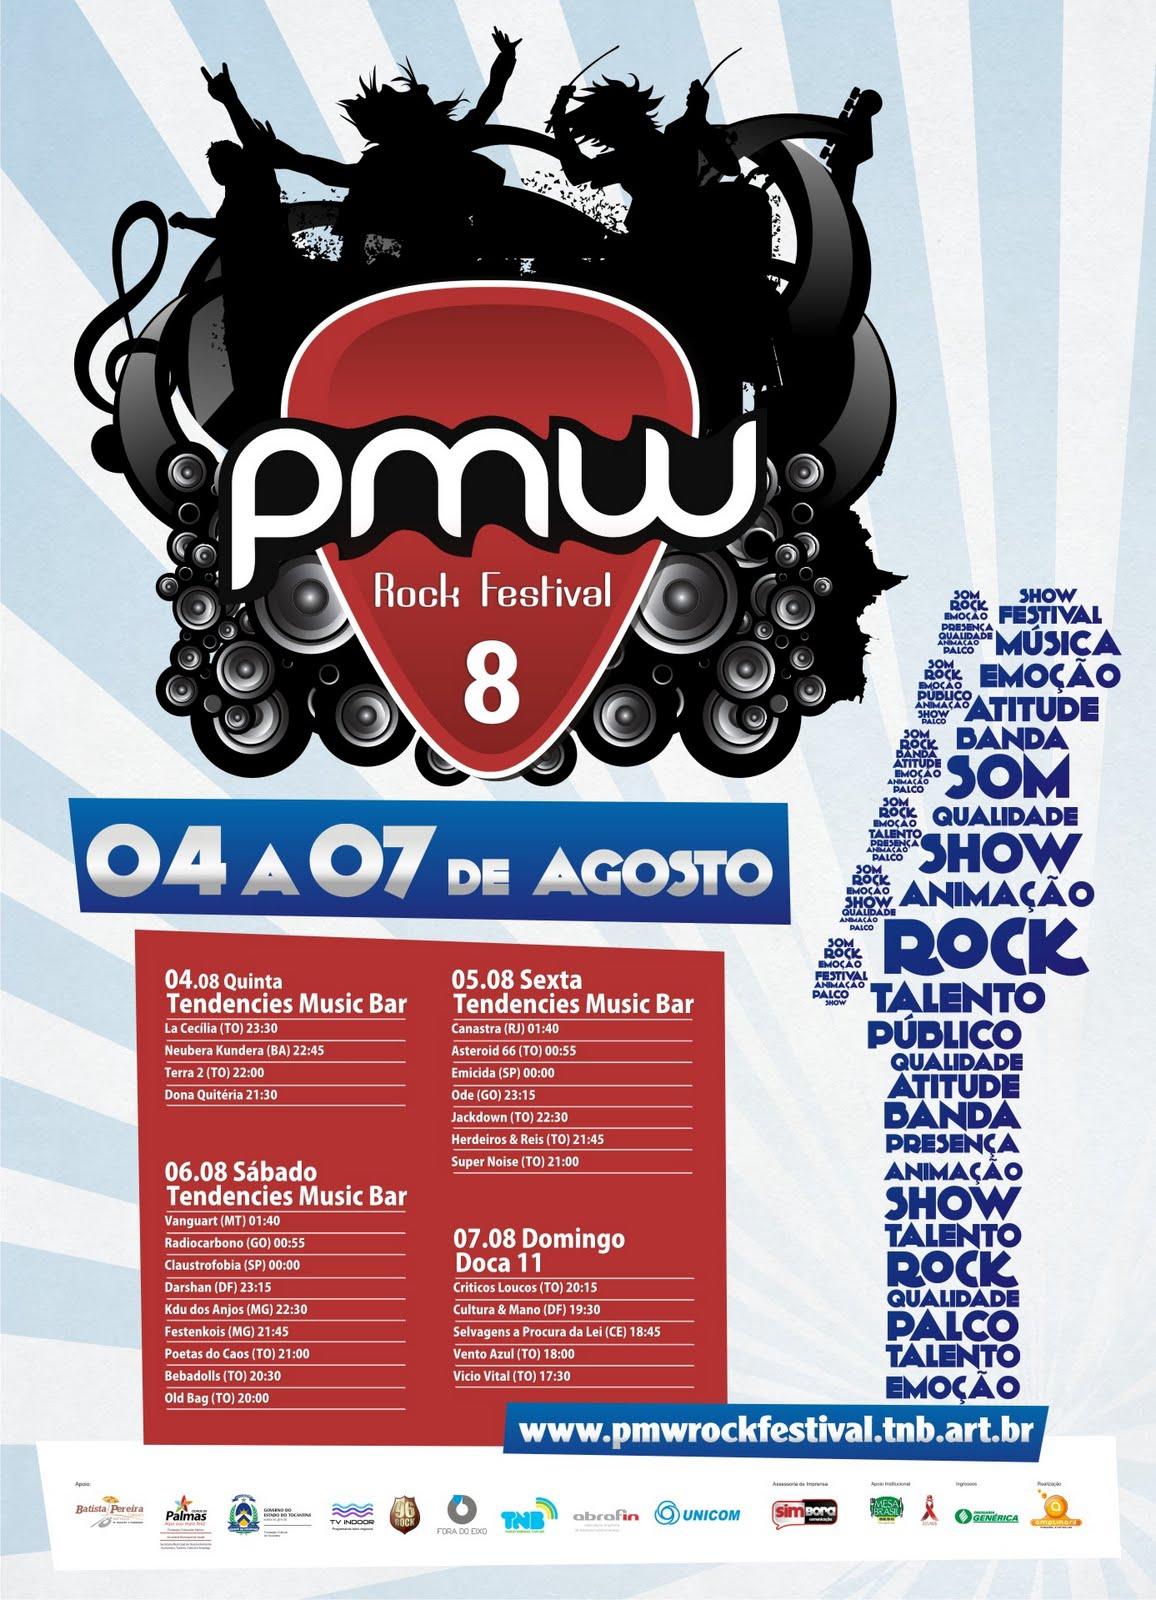 8º Pmw Rock Festival 04 a 07 de Agosto